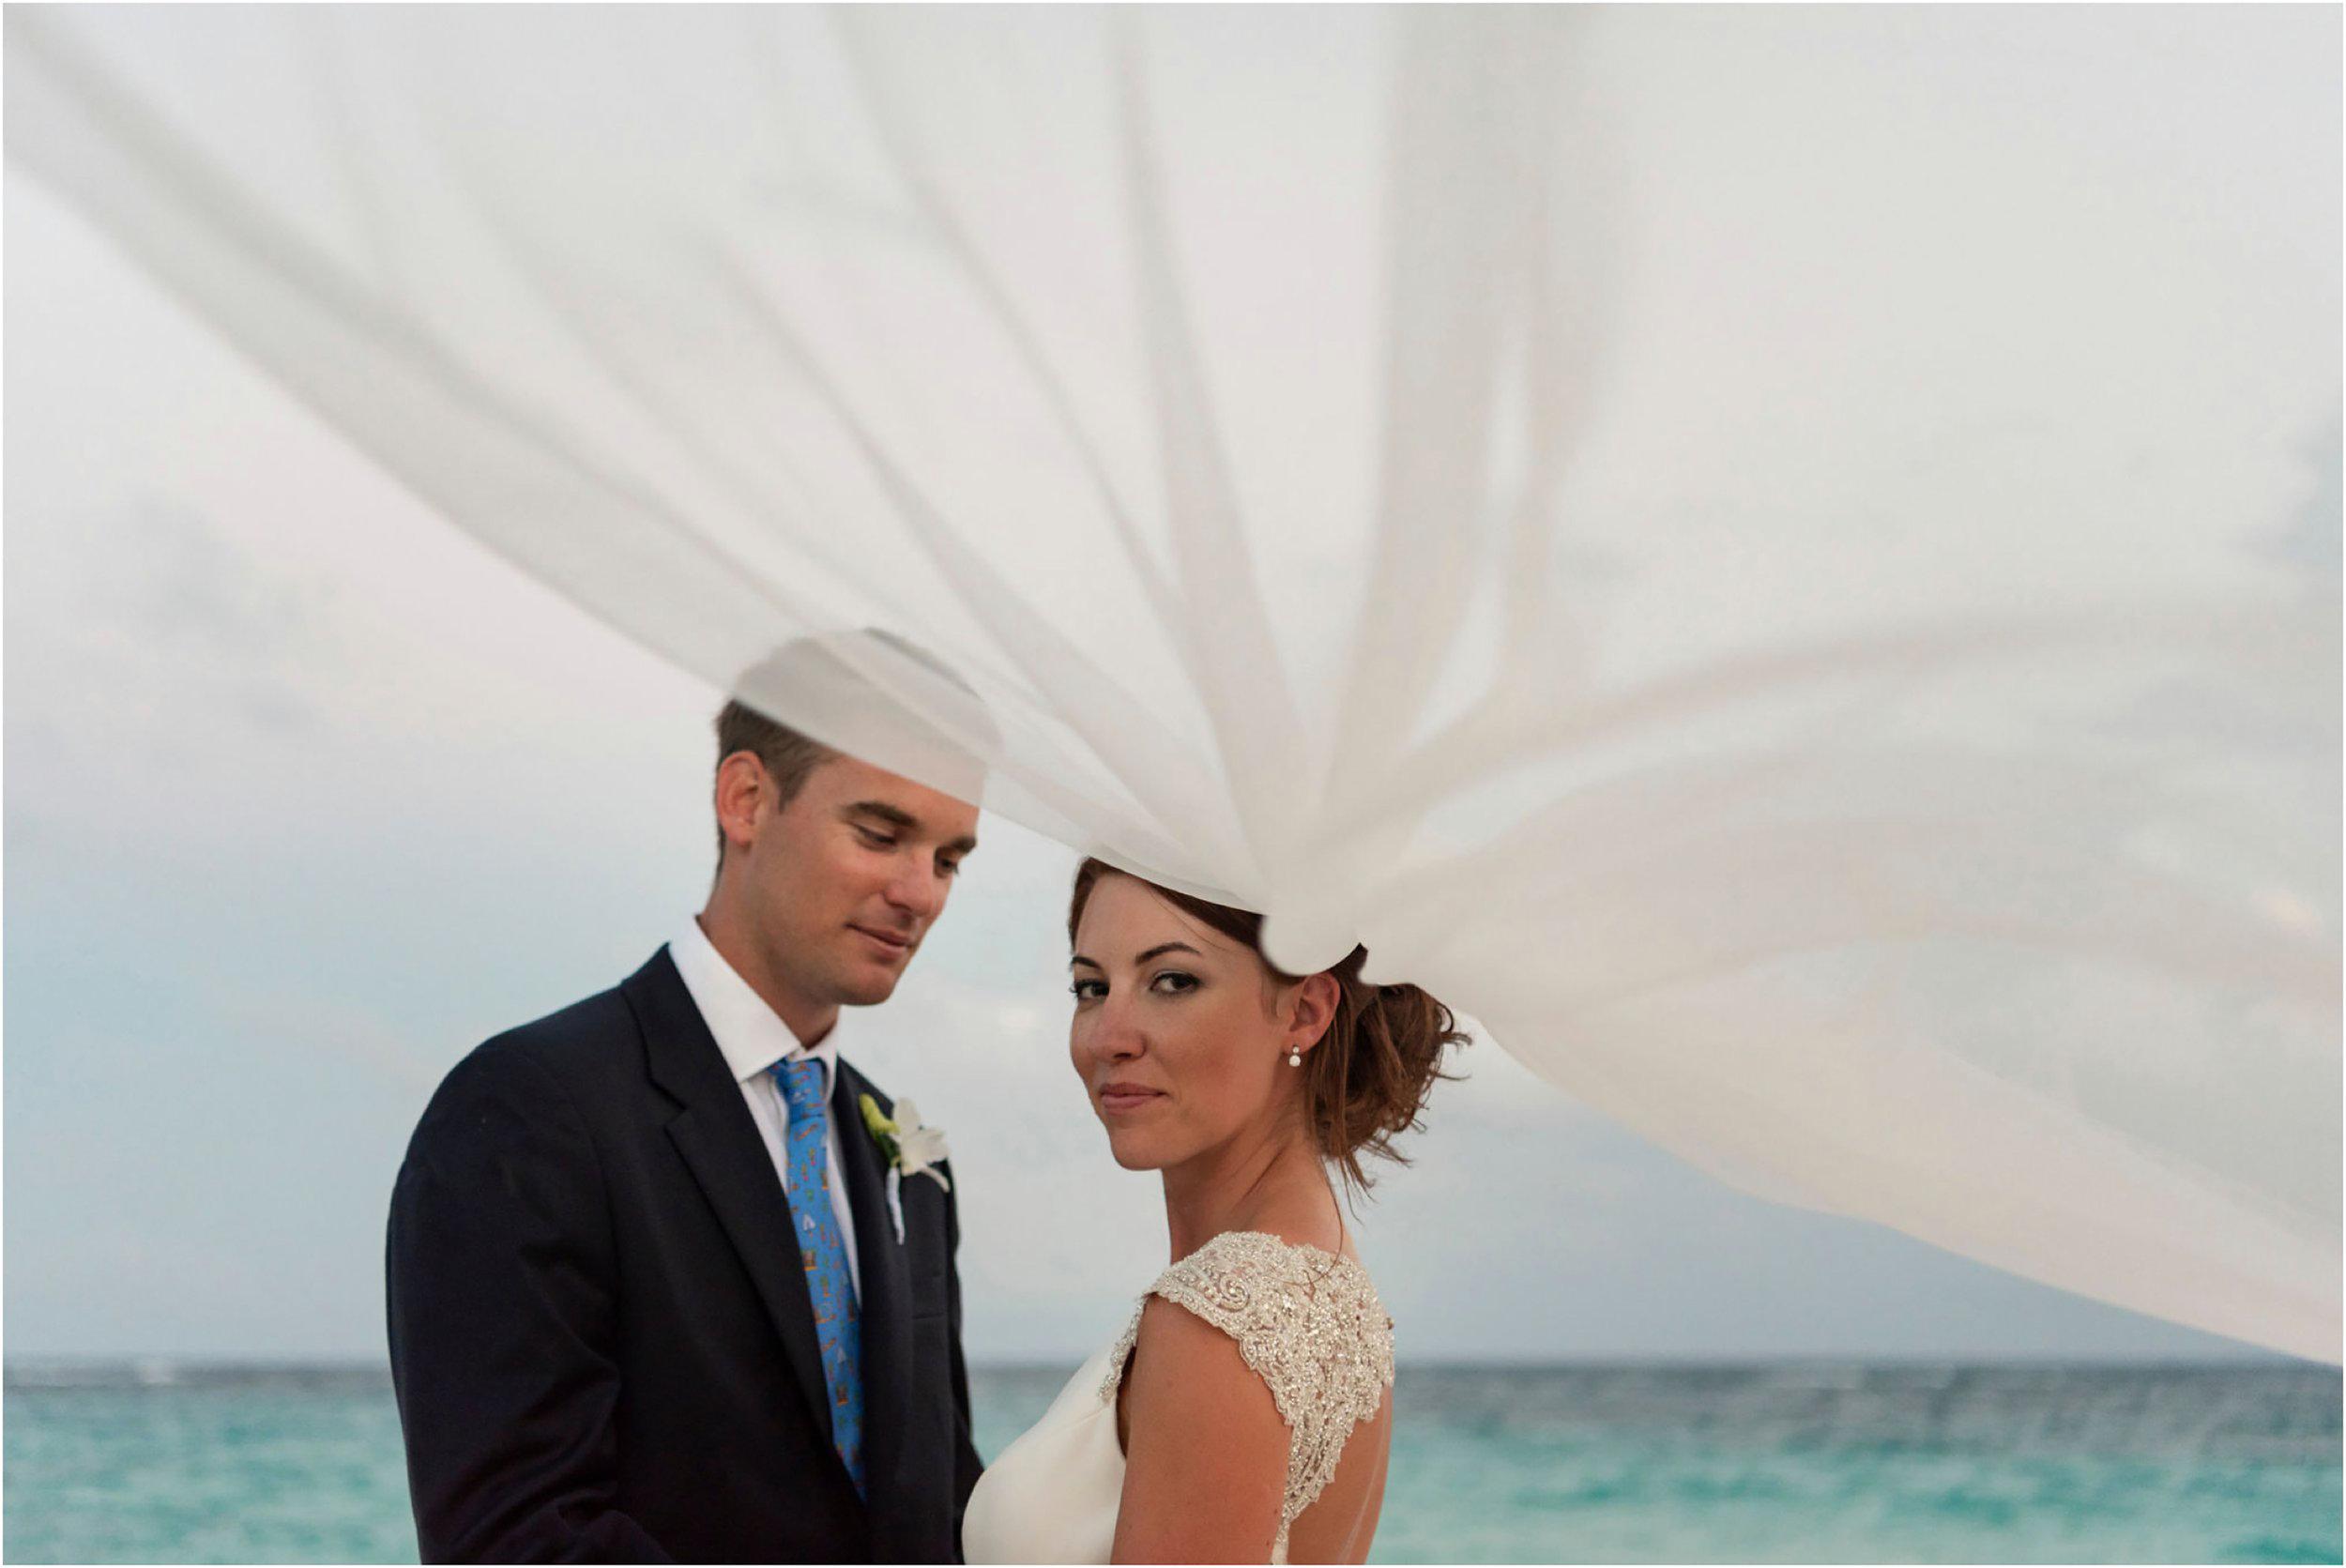 ©FianderFoto_Bermuda Wedding Photographer_Mid Ocean_Rachel_Angus_078.jpg